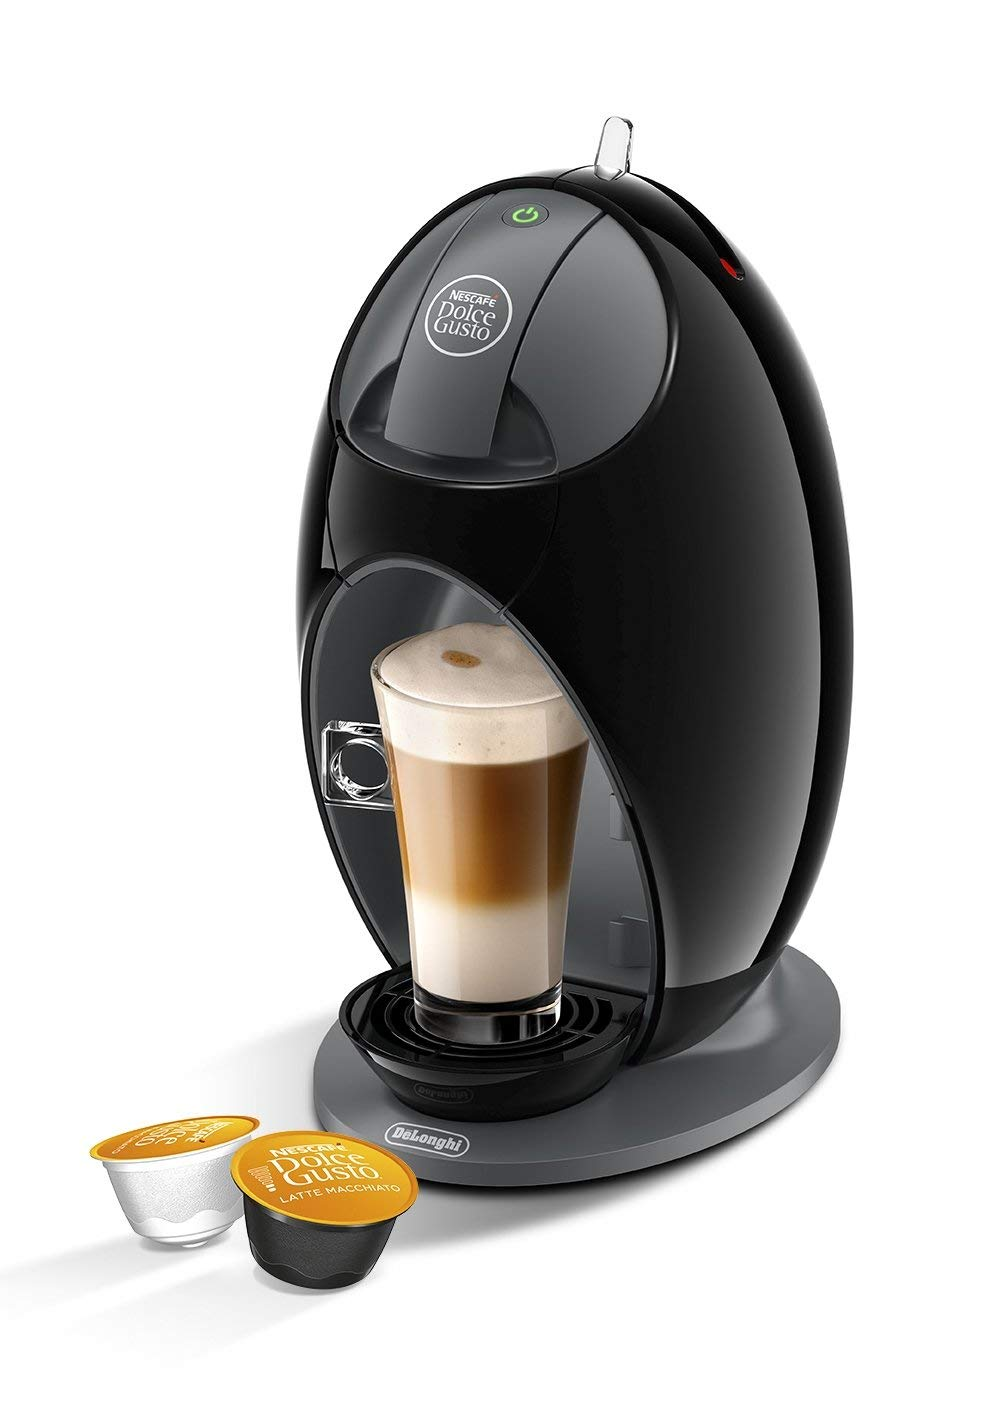 Nescafé Dolce Gusto Jovia by De'Longhi – EDG250B Coffee Machine – Black